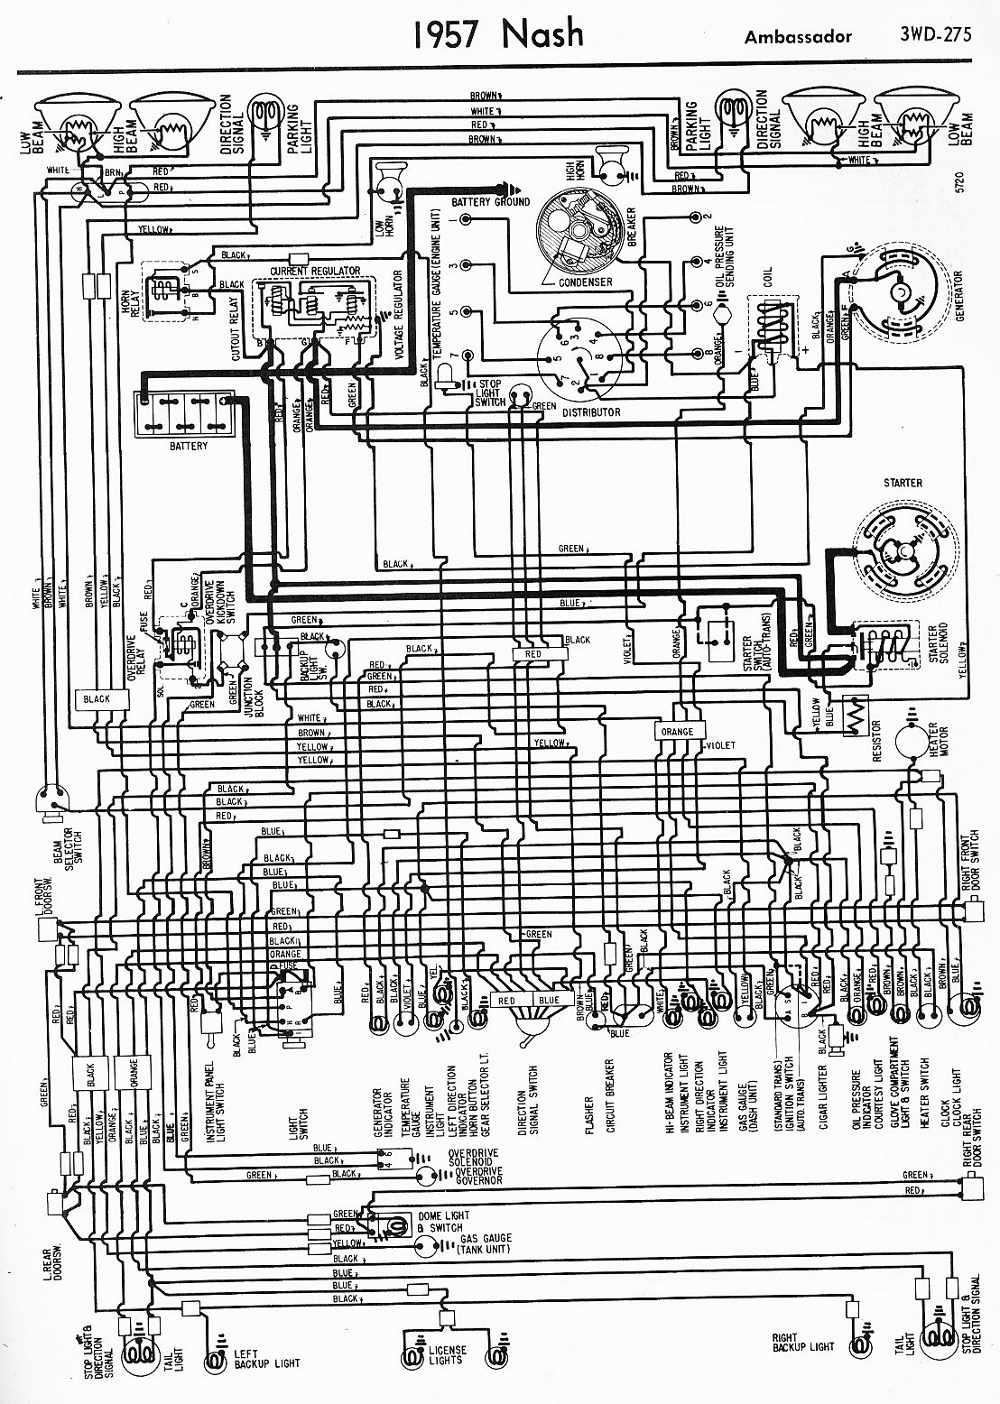 wiring diagrams of 1957 nash ambassador?t=1508500490 nash car manuals, wiring diagrams pdf & fault codes nash metropolitan wiring diagram at reclaimingppi.co